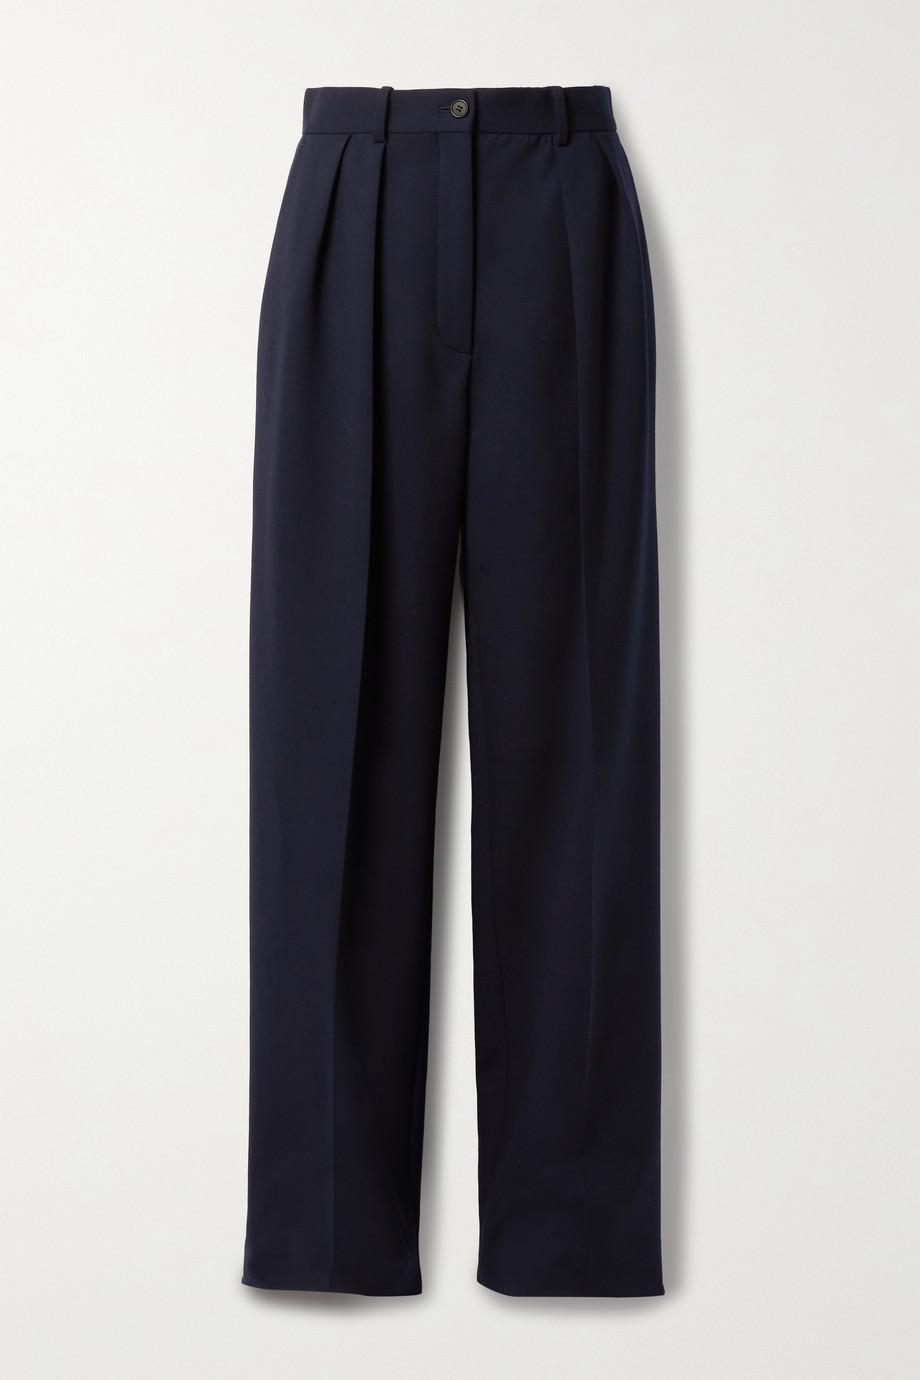 The Row Igor pleated wool-blend wide-leg pants